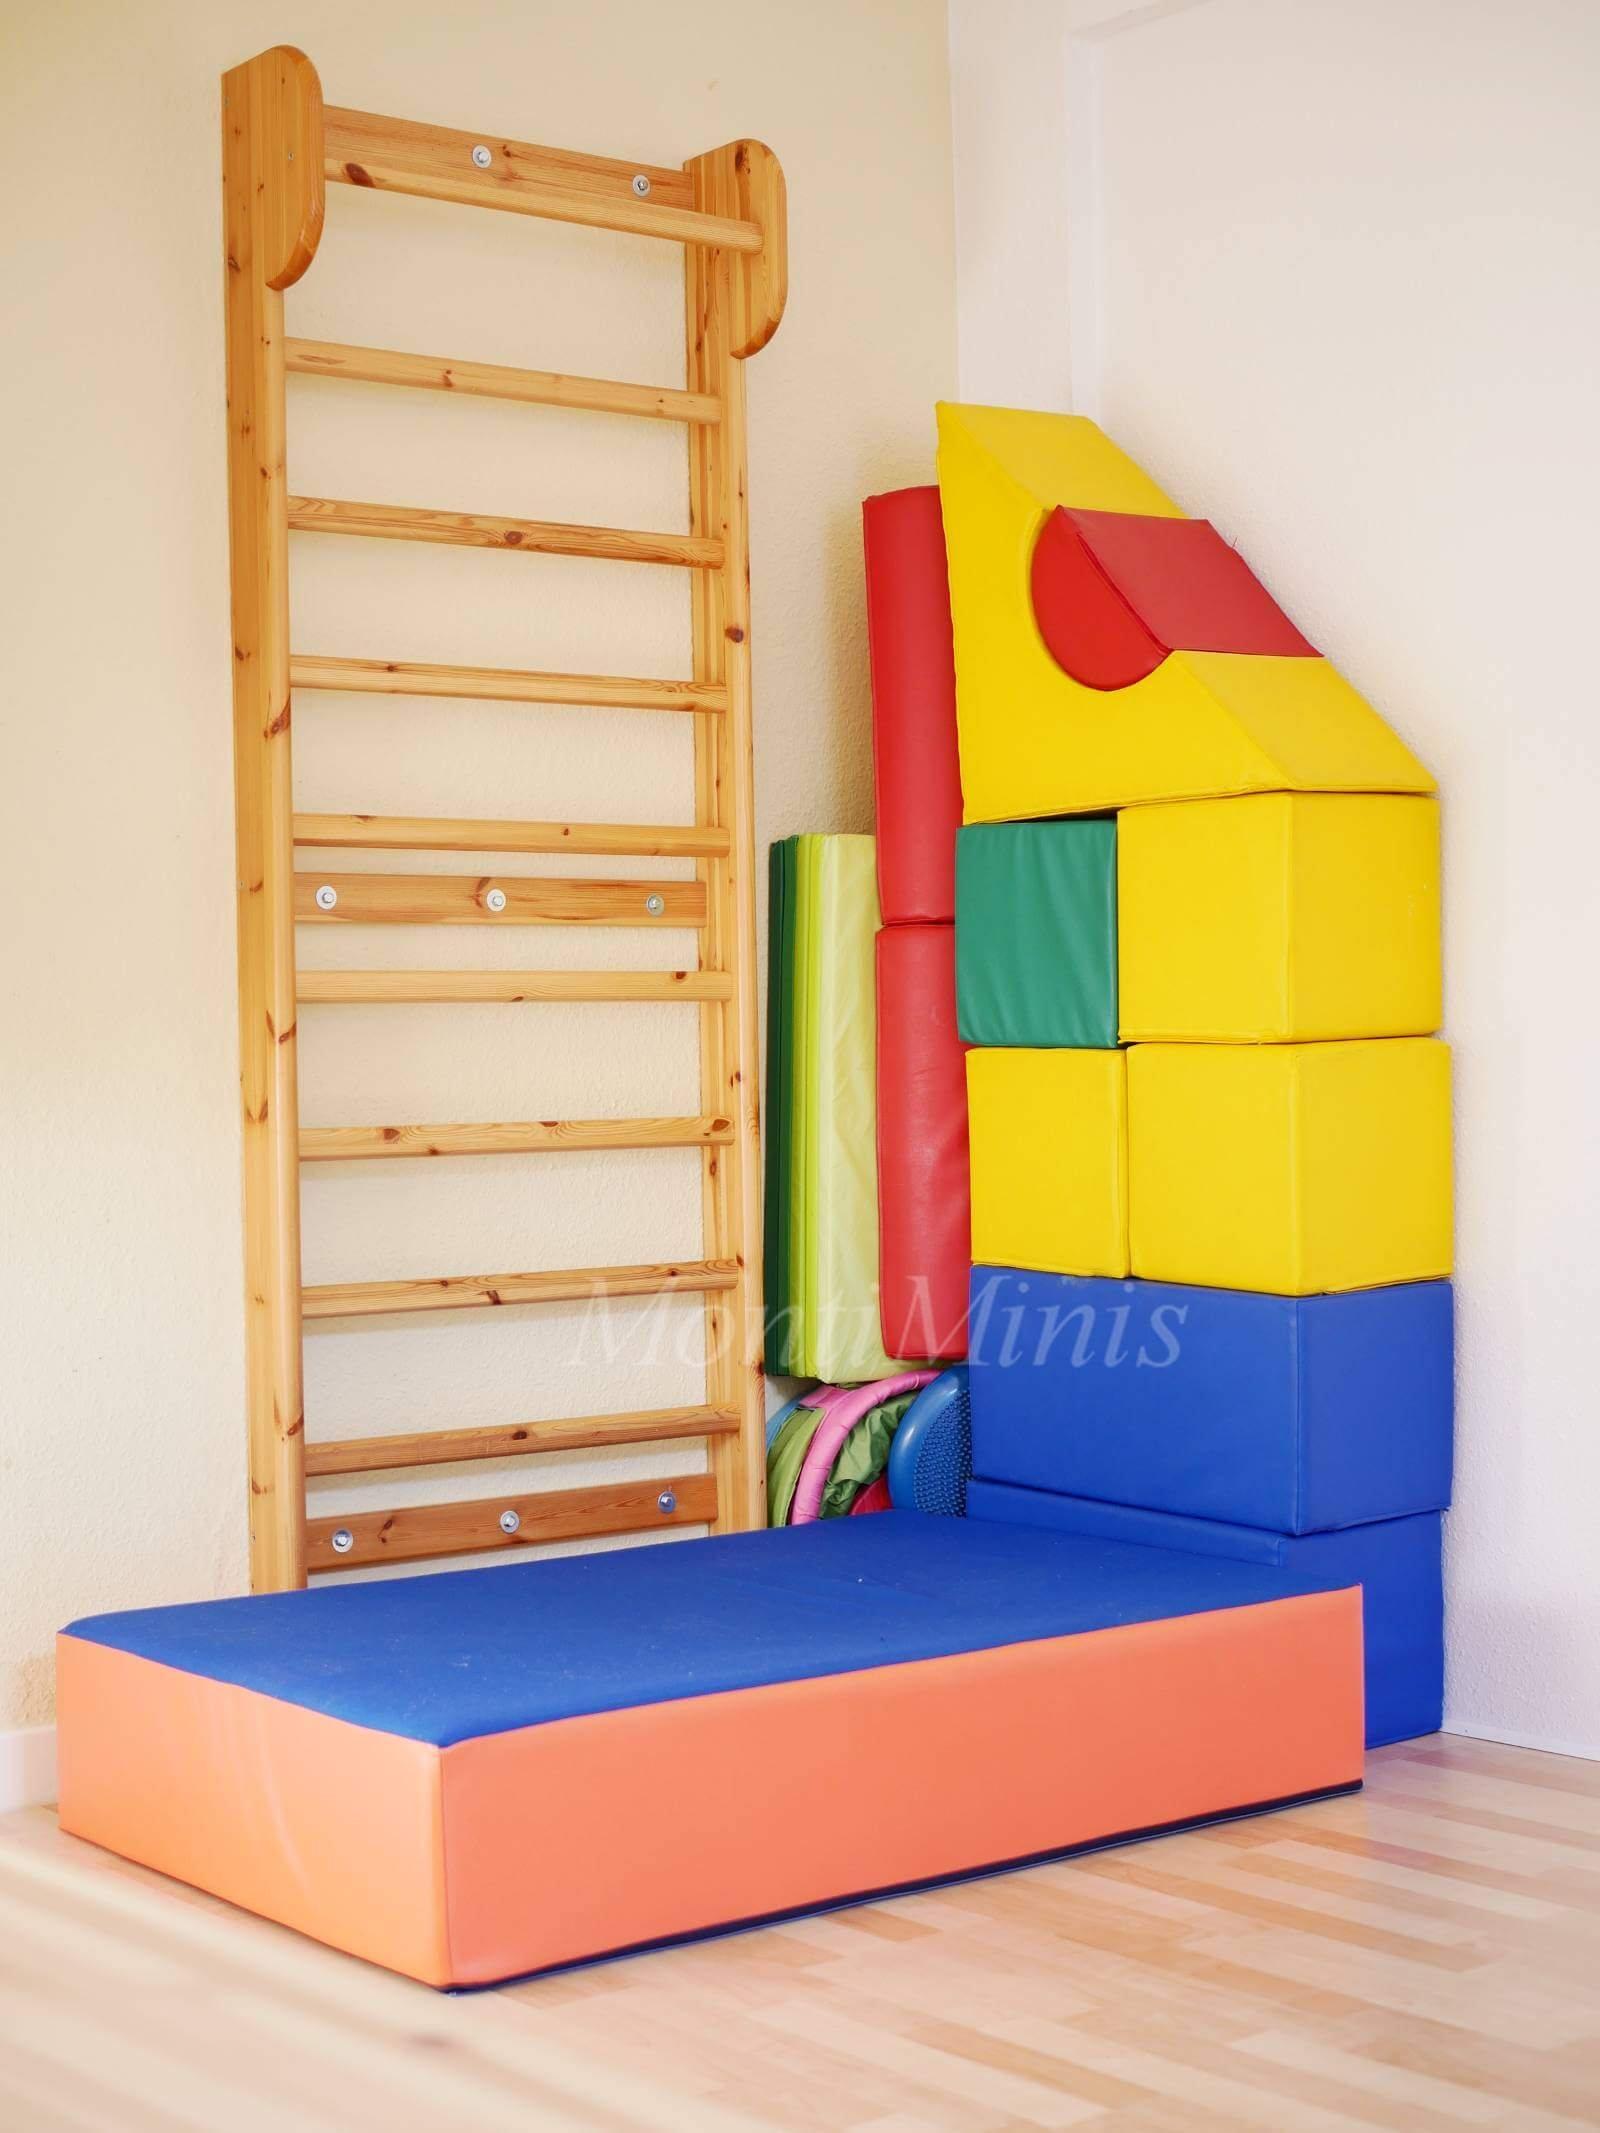 Full Size of Klettern Regale Kinderzimmer Regal Weiß Sofa Kinderzimmer Sprossenwand Kinderzimmer